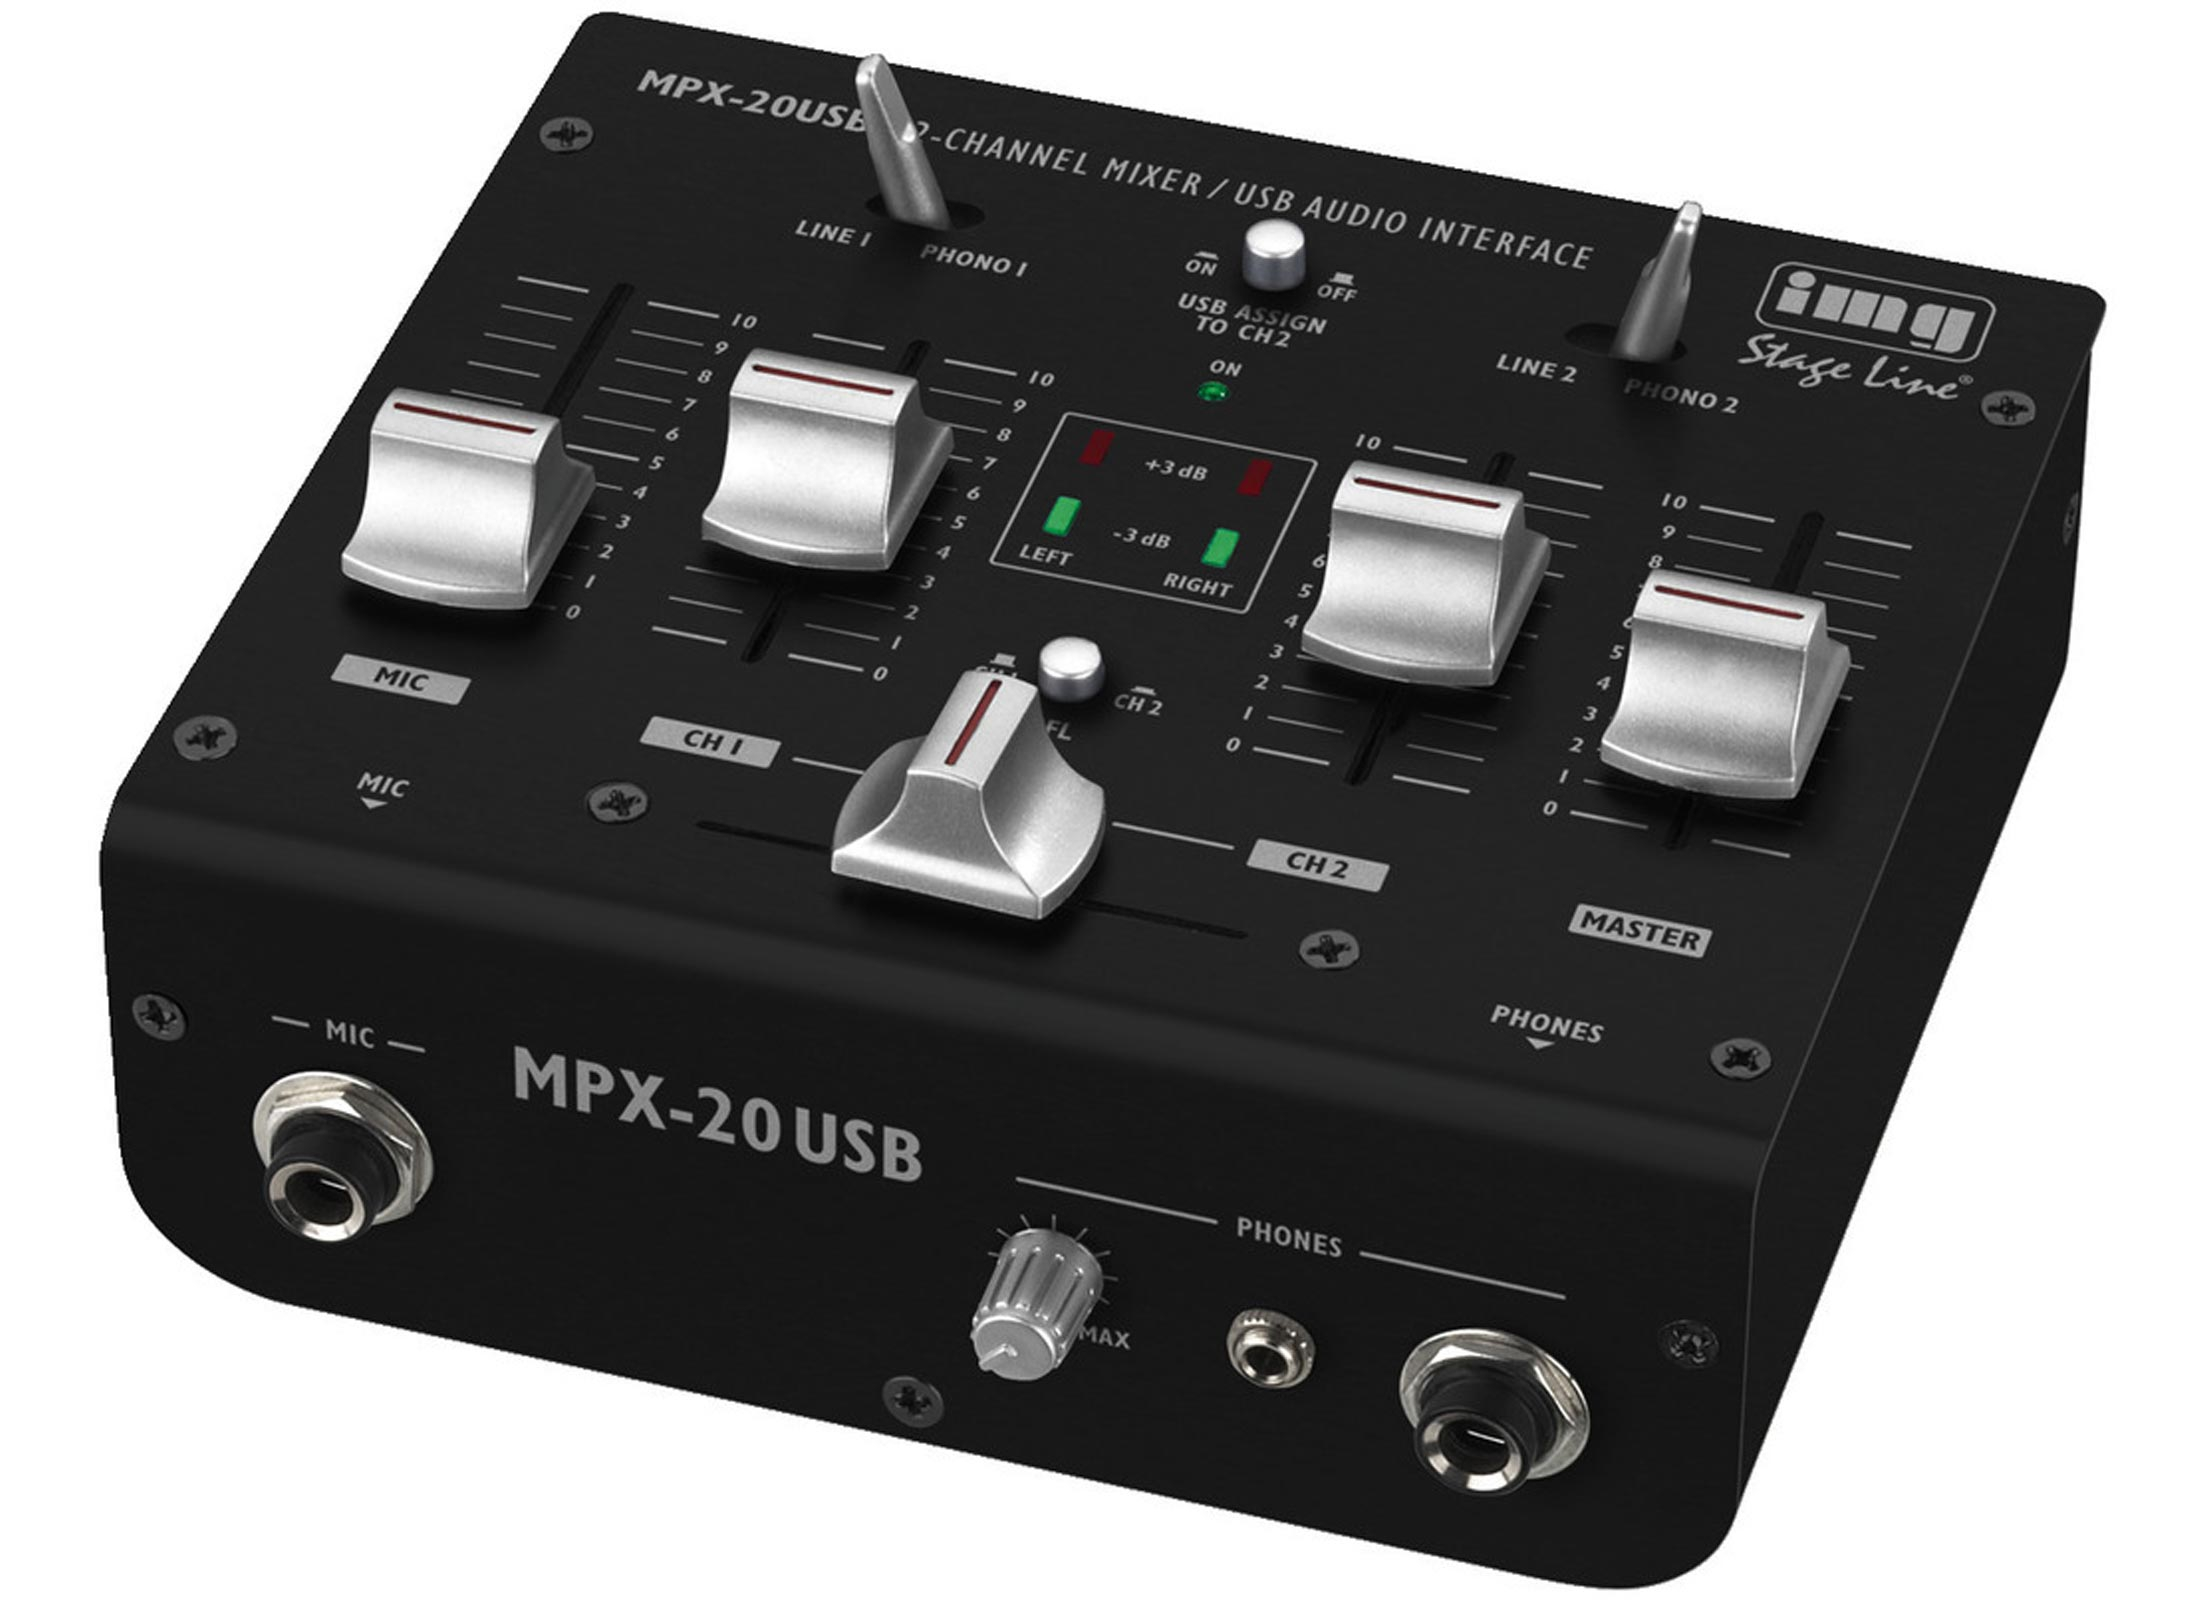 IMG STAGELINE MPX-20USB DJ-Mixer, 3-Channel, USB, 1x Mic, 2x Stereo